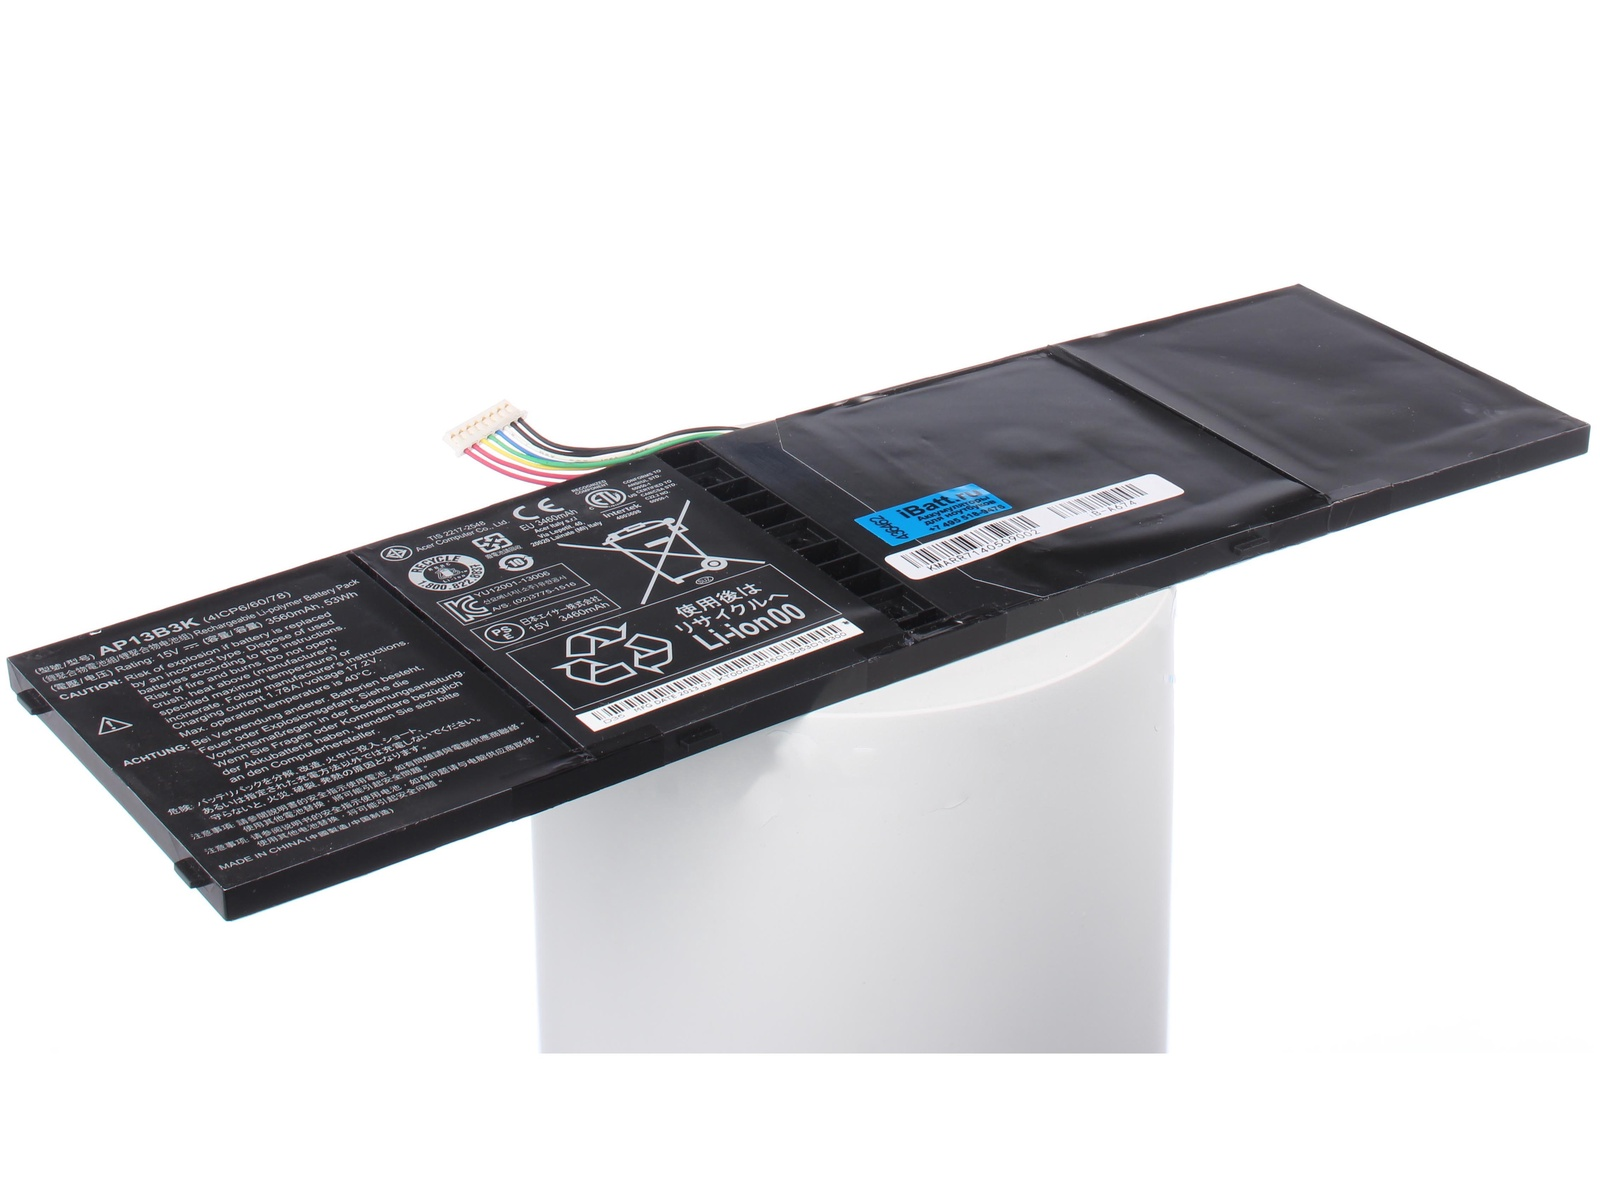 Аккумулятор для ноутбука iBatt для Acer Aspire ES1-511-C9Q3, Aspire R7-571G-53336G75ass, Aspire F5-572G, Aspire ES1-511-C5G6, Aspire V5-572G-53336G50akk, Aspire V7-582PG-74506G52tii, Aspire R3-471T, Aspire R7-572 ноутбук acer aspire es1 731g c4e3 nx mzter 012